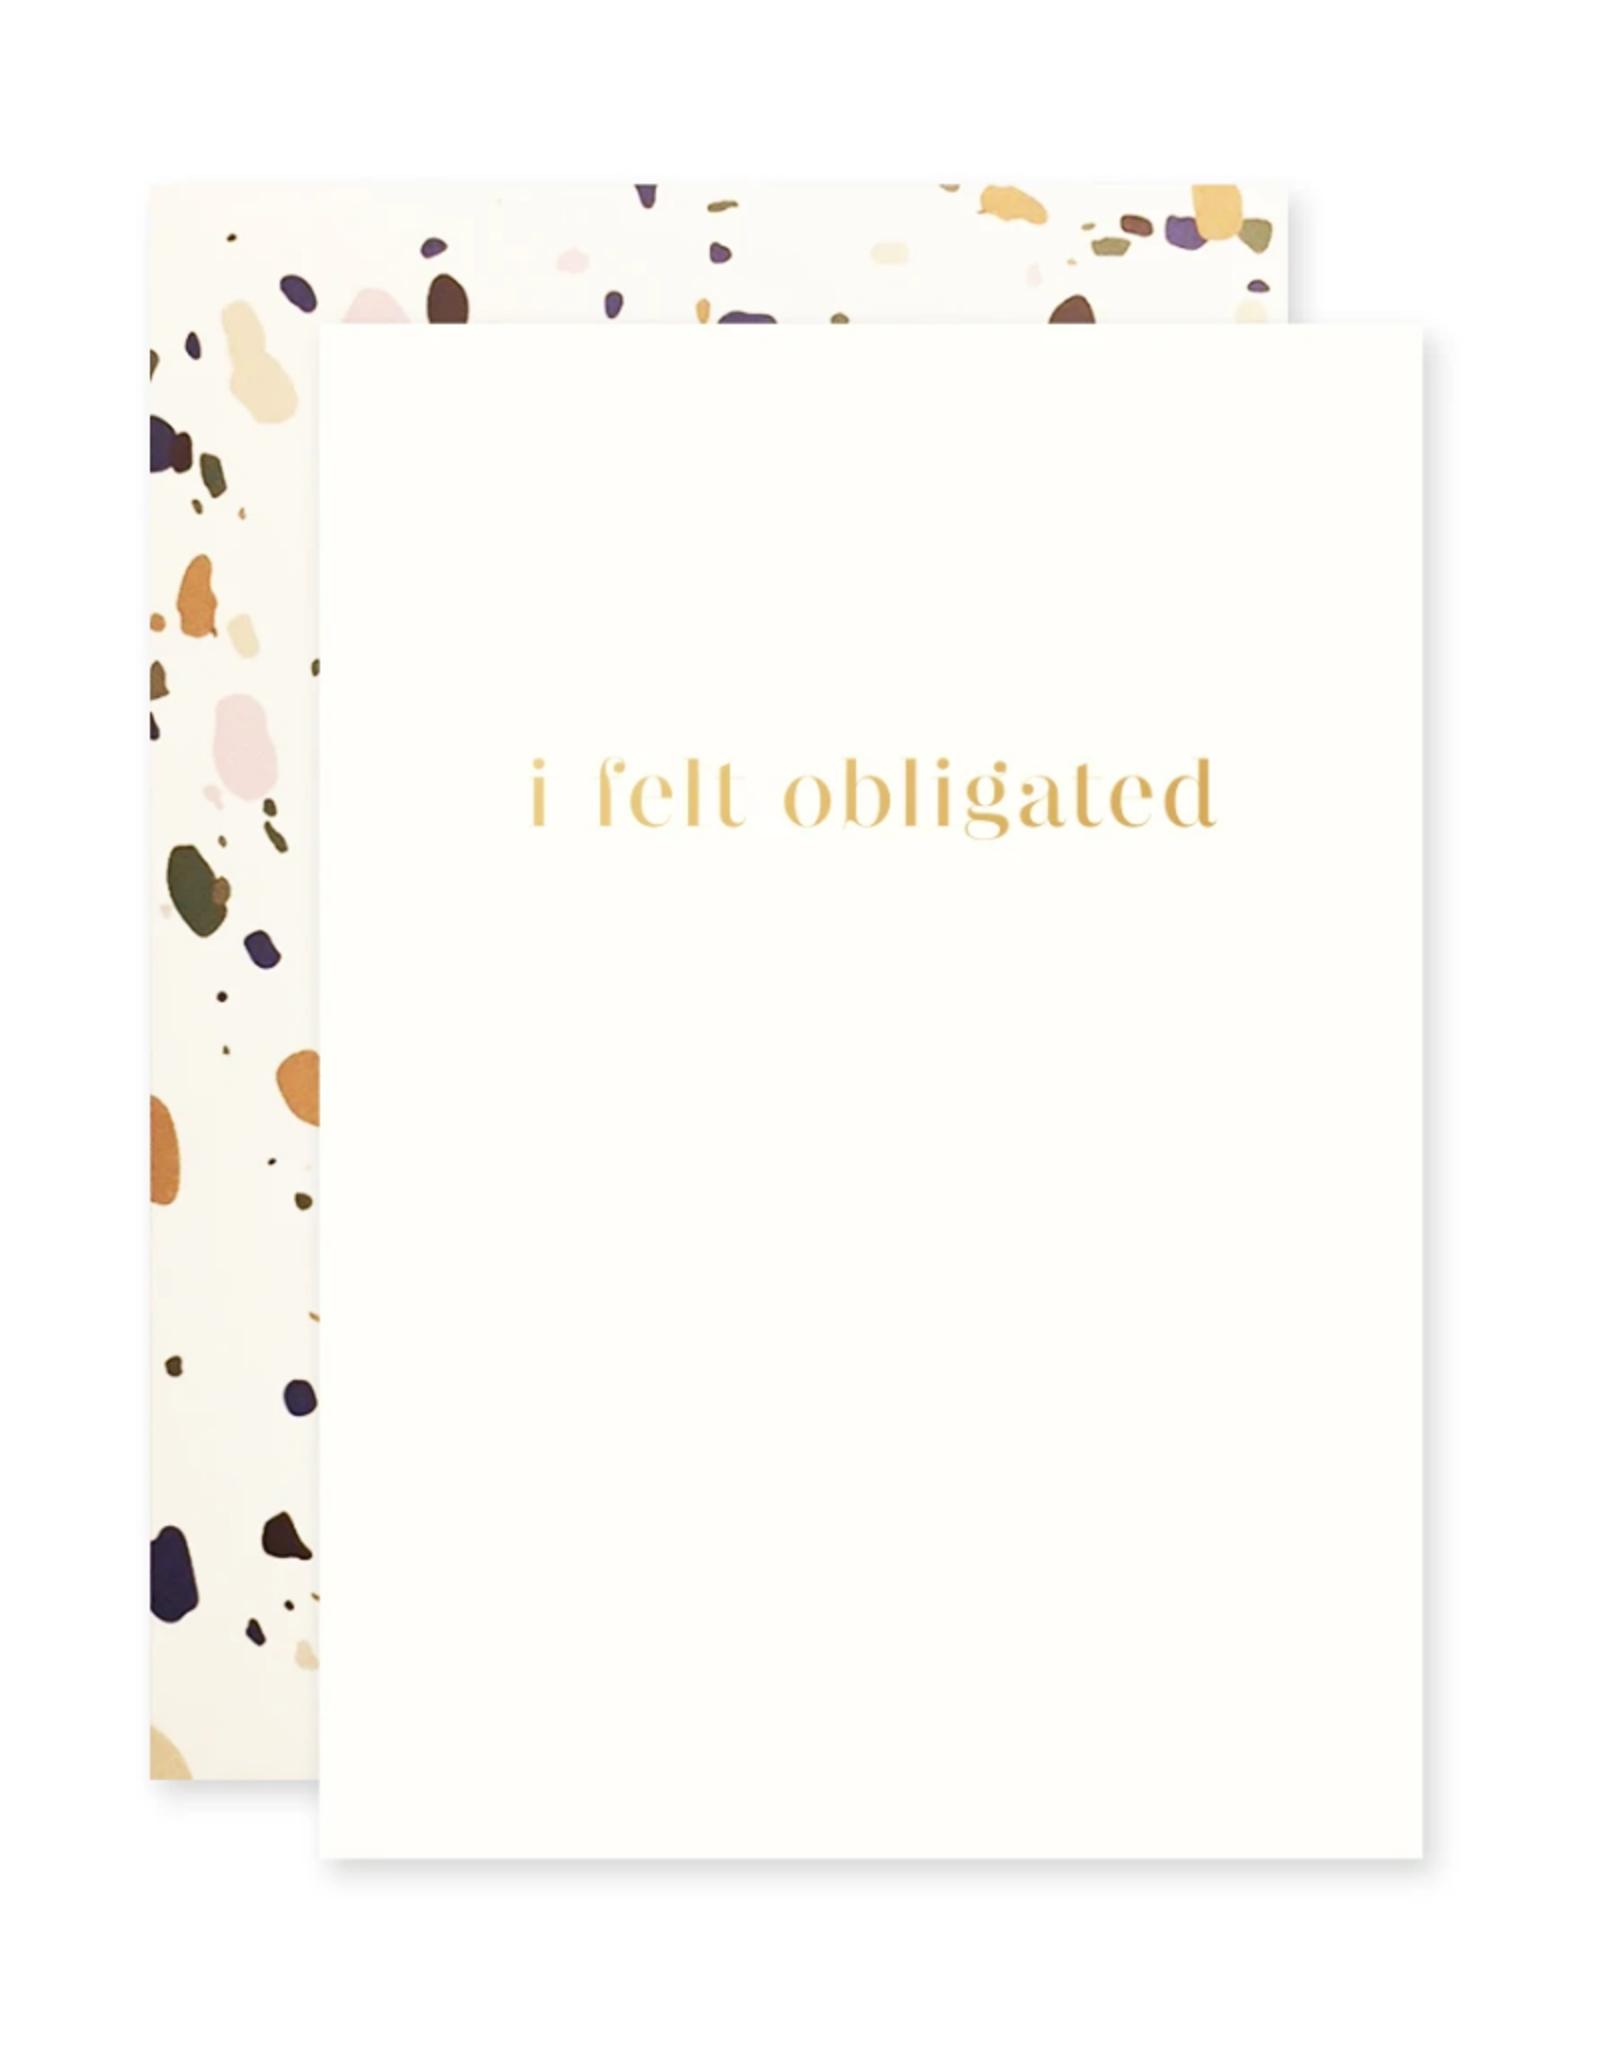 The Social Type Felt Obligated Humorous Card